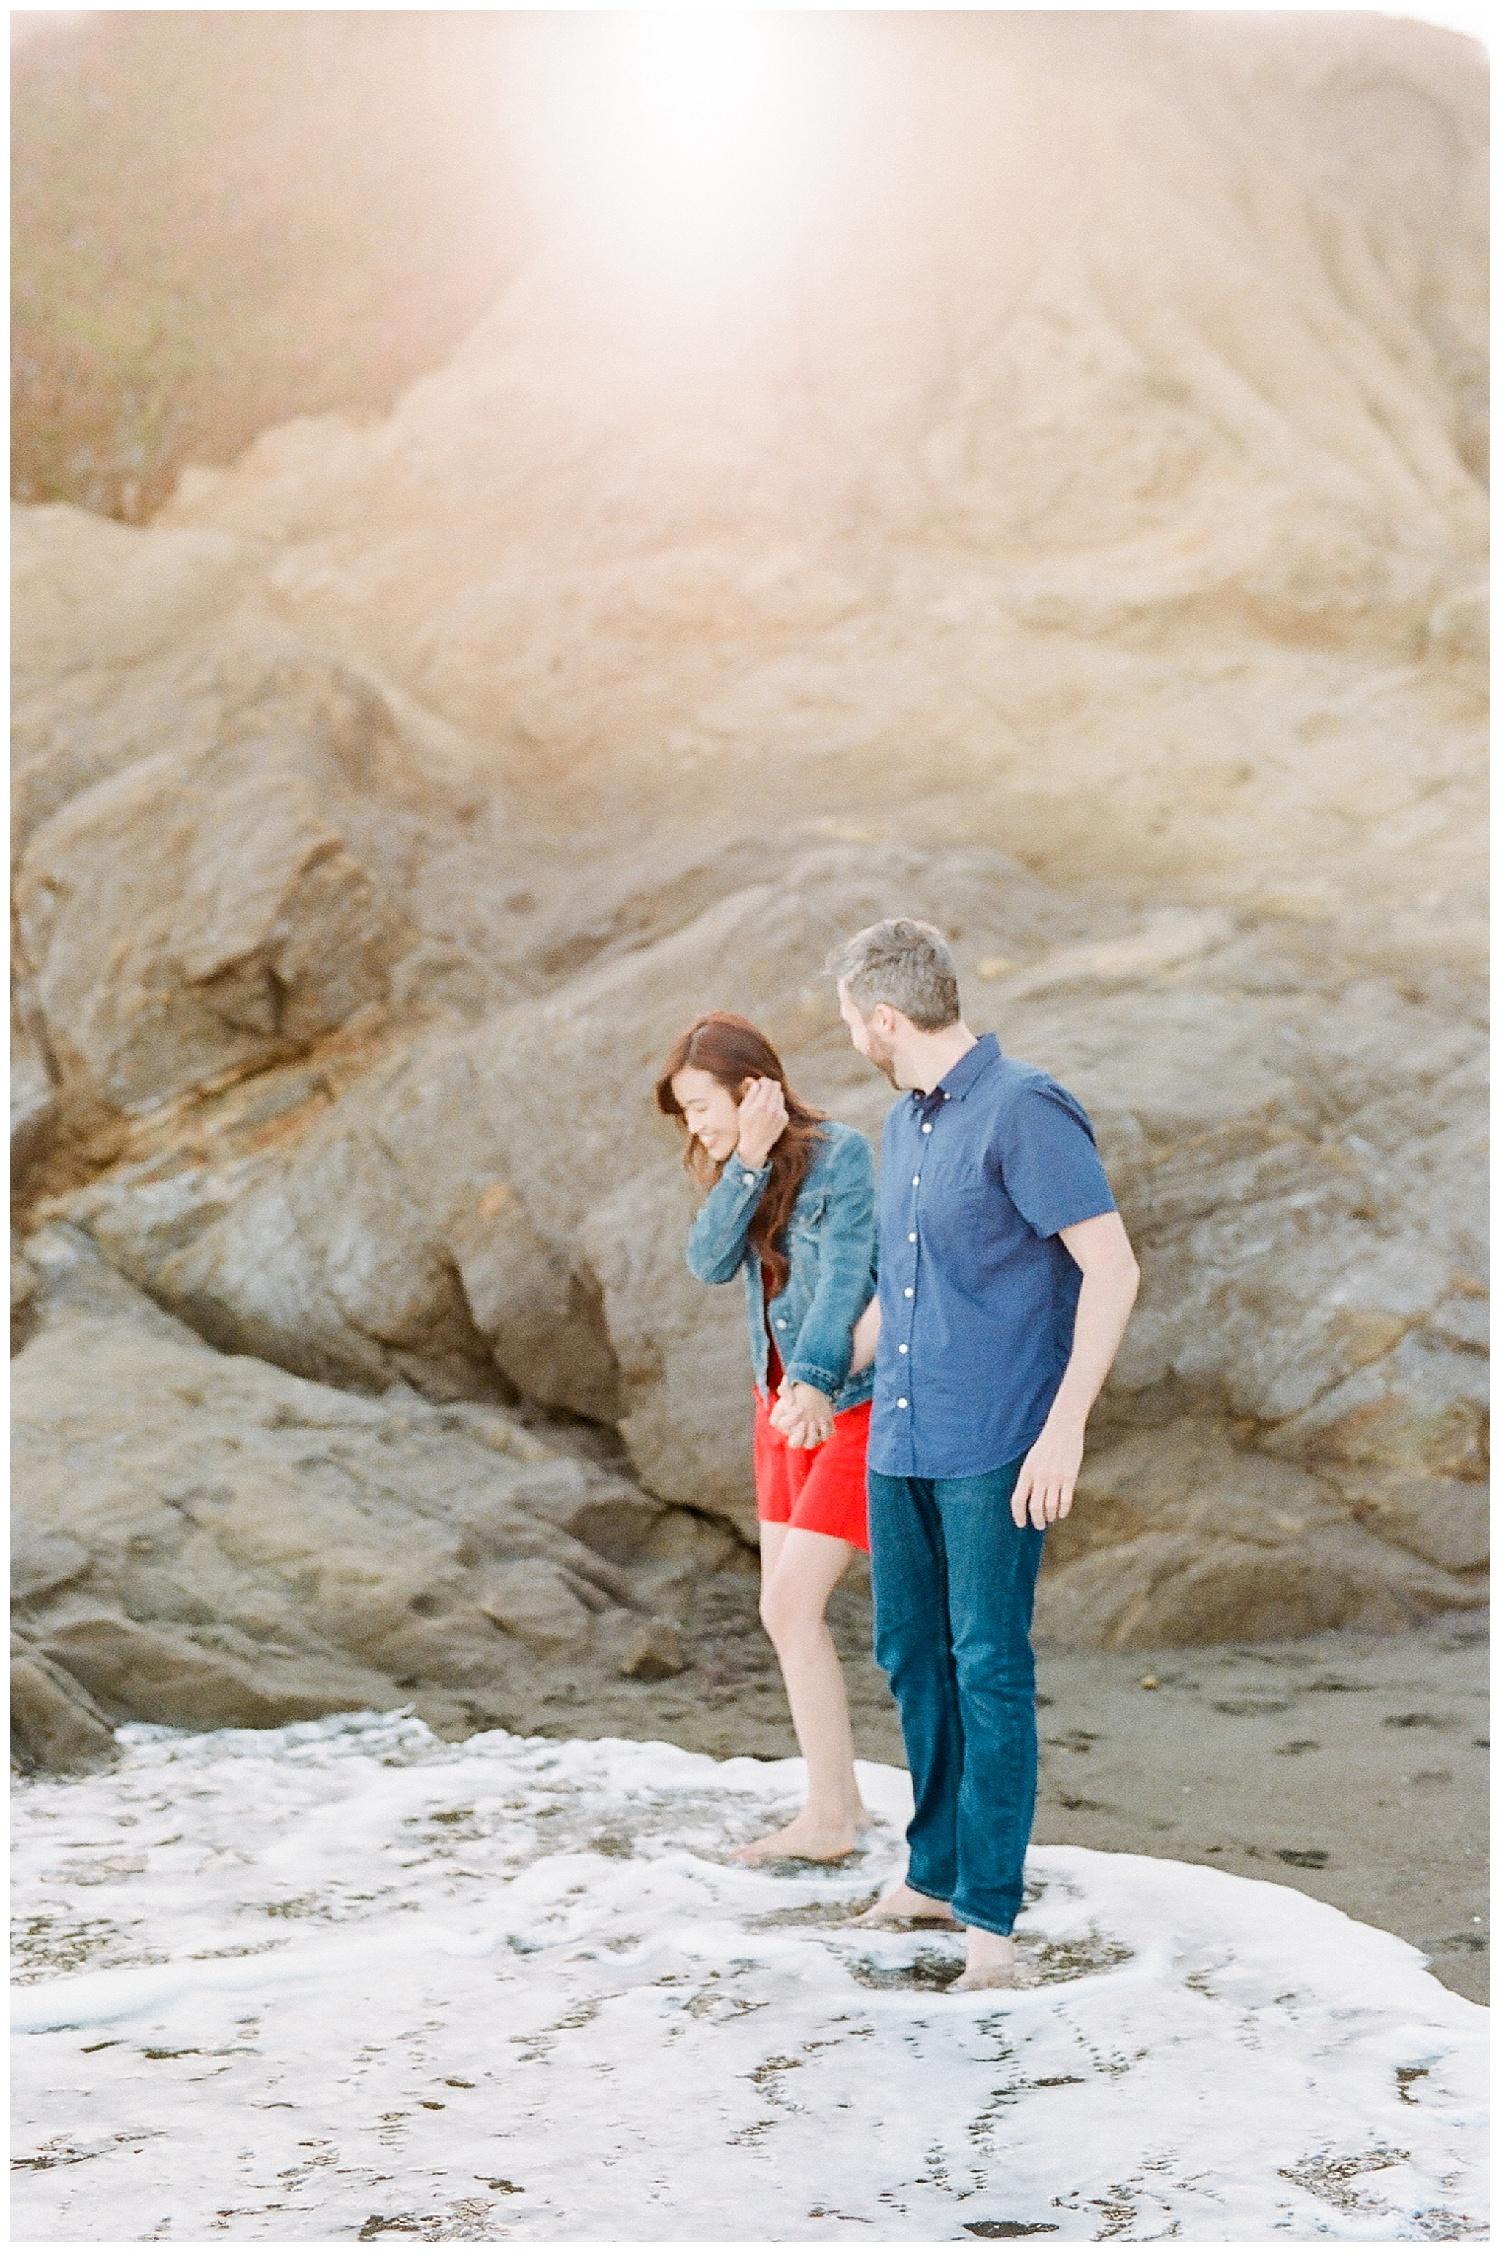 Janine_Licare_Photography_San_Francisco_Wedding_Photographer_0017.jpg